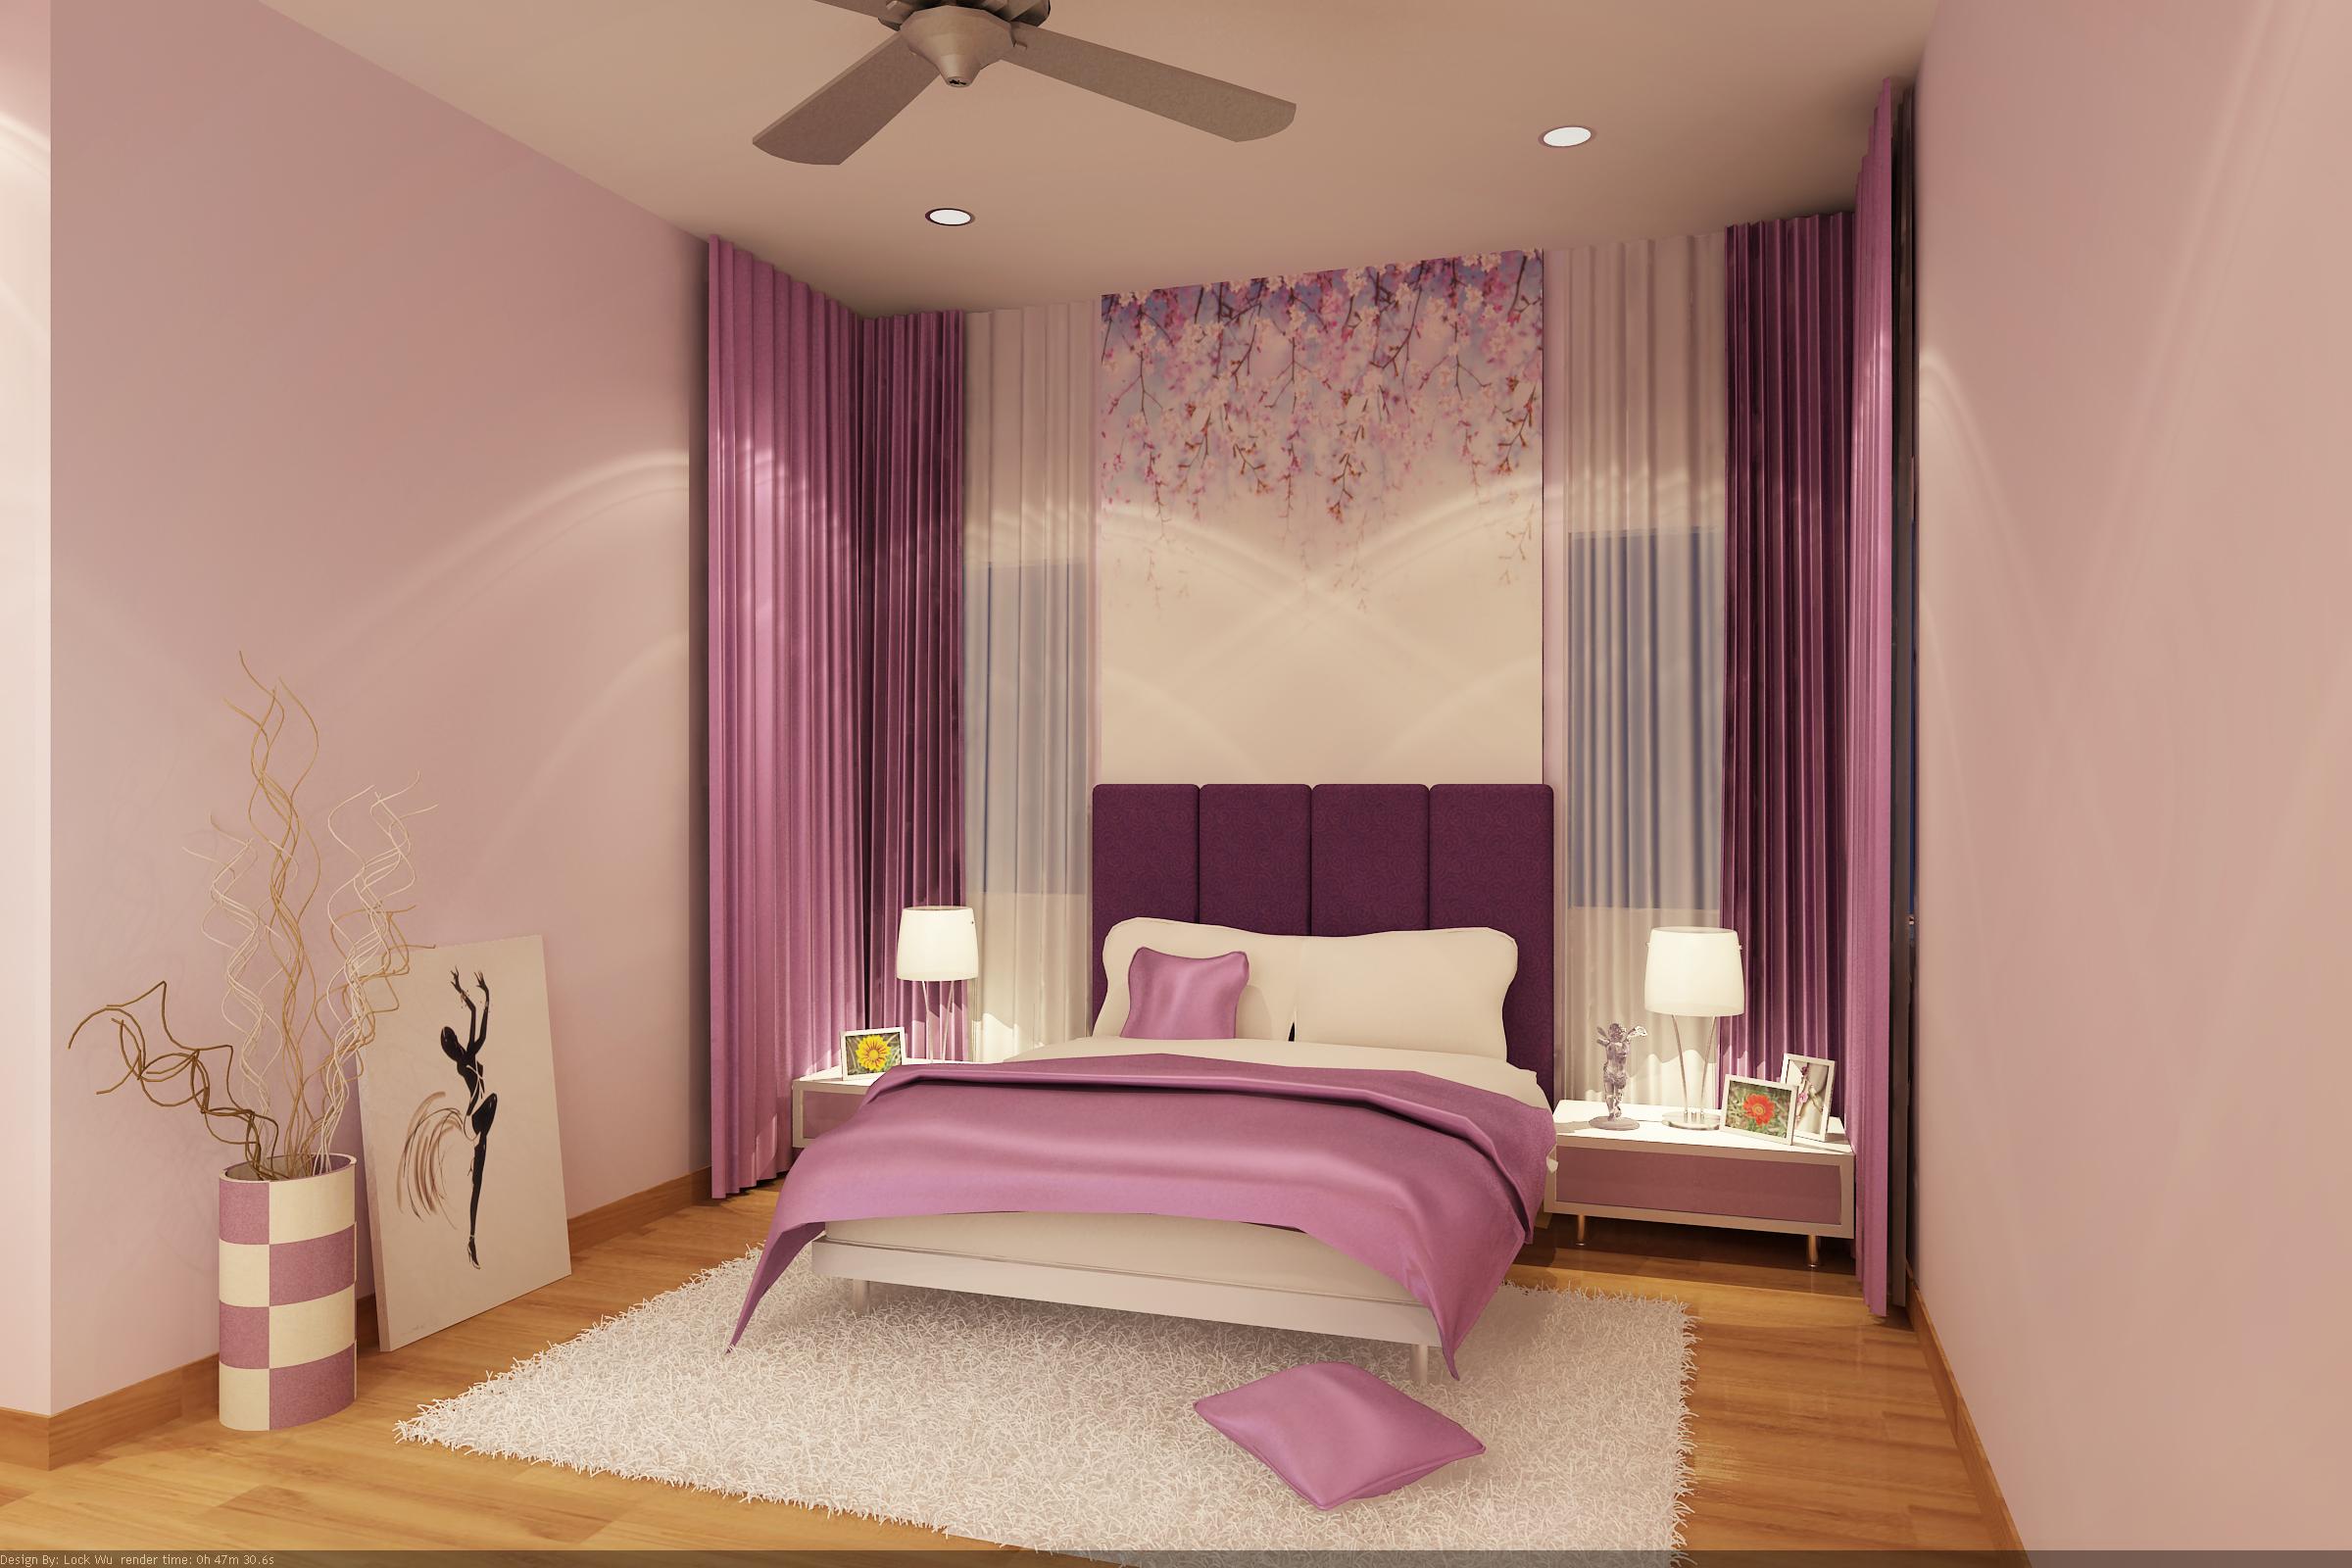 Residential Projects By Savita Menon At Coroflot